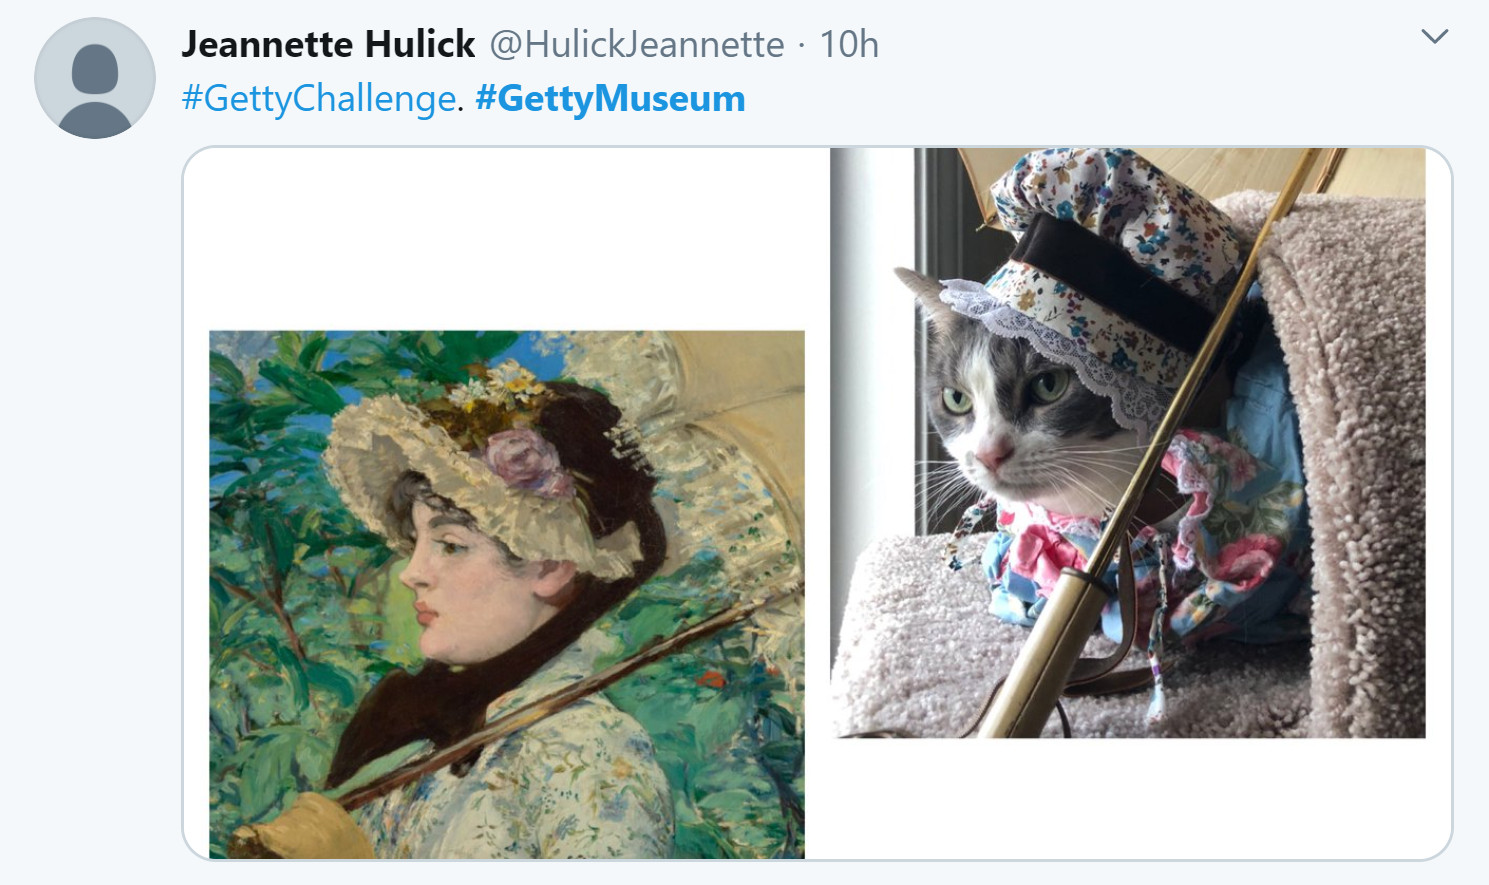 getty museum challenge jeannette gatto